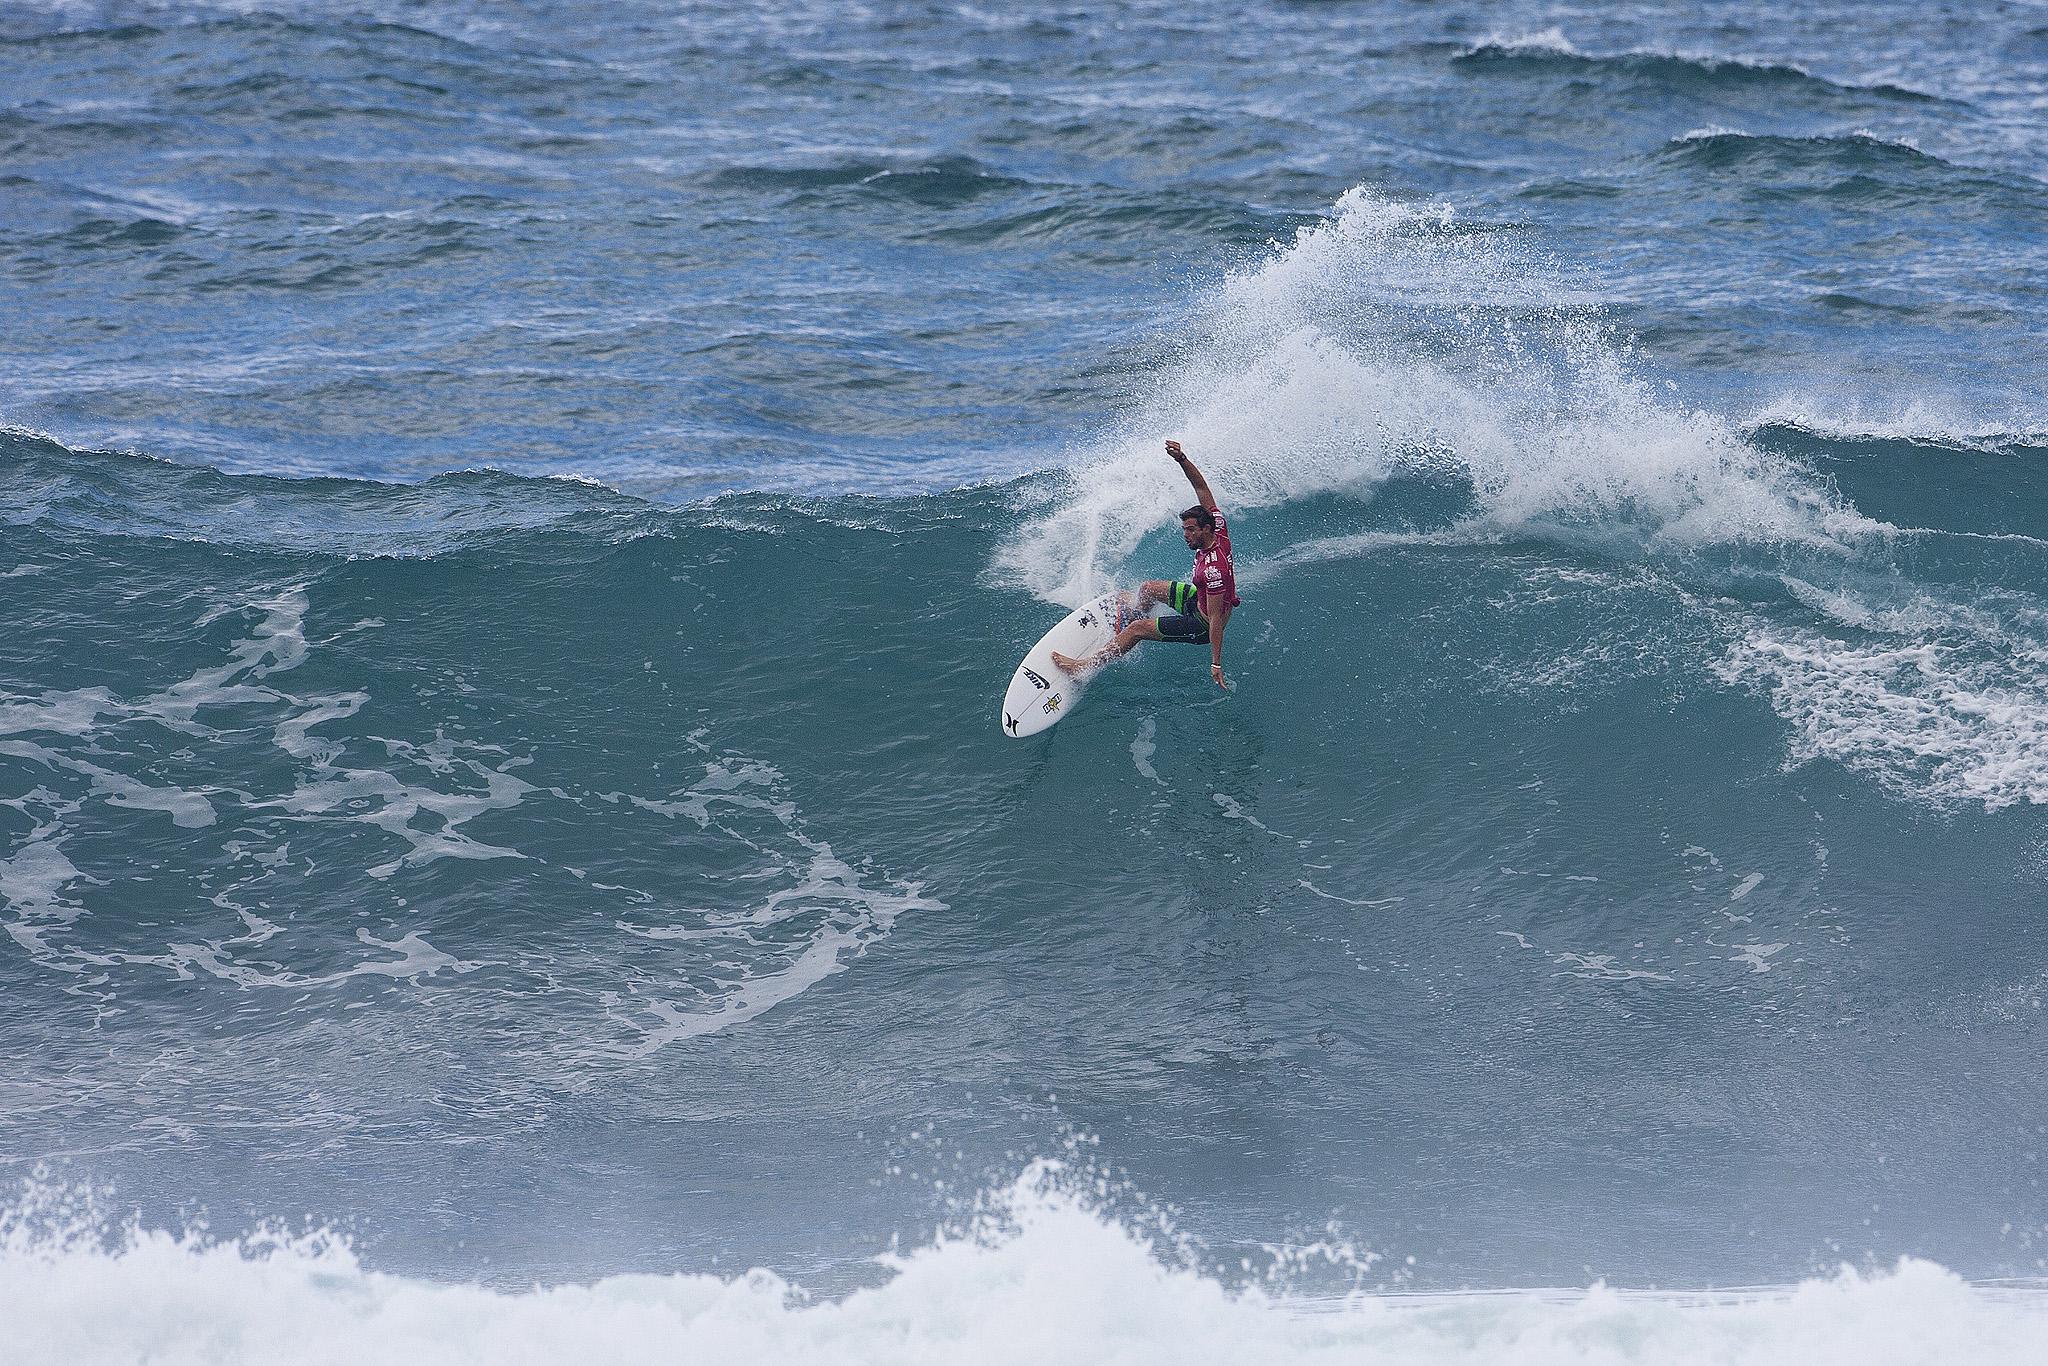 Alejo Muniz (Brasil) / Vans World Cup of Surfing/ Handout